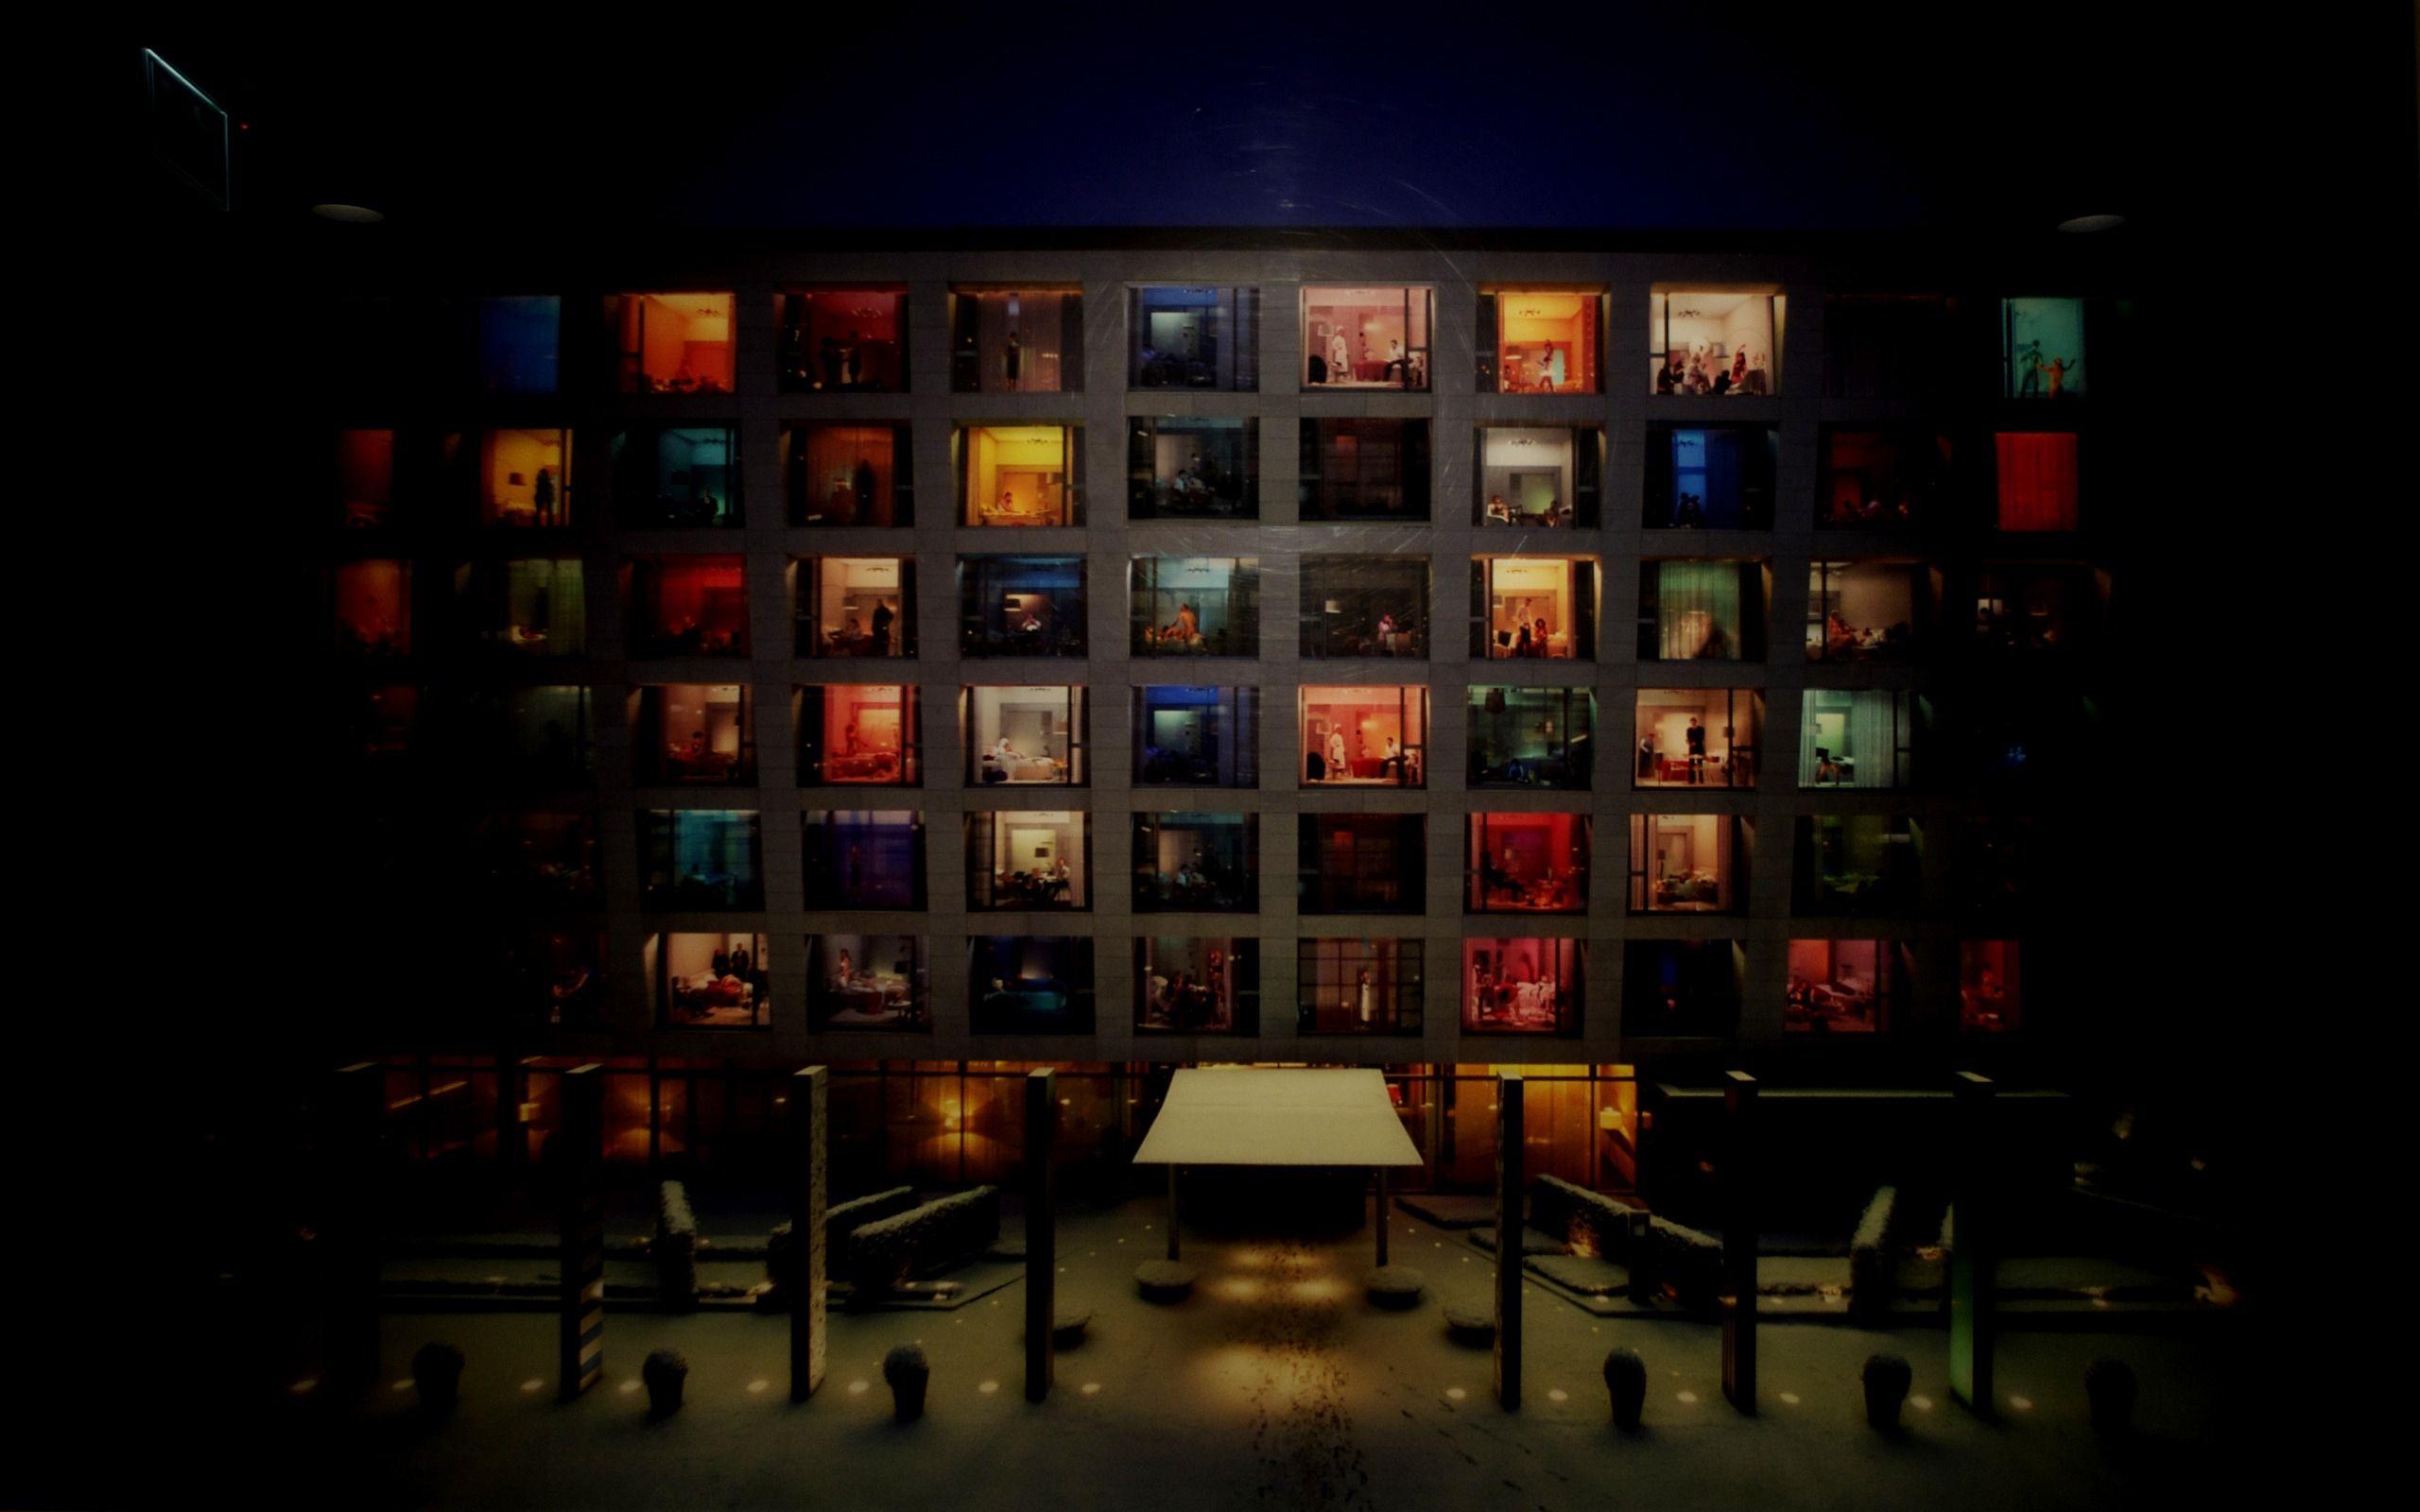 CitizenM Hotel Artistic wallpaper, Apartment building, Hotel